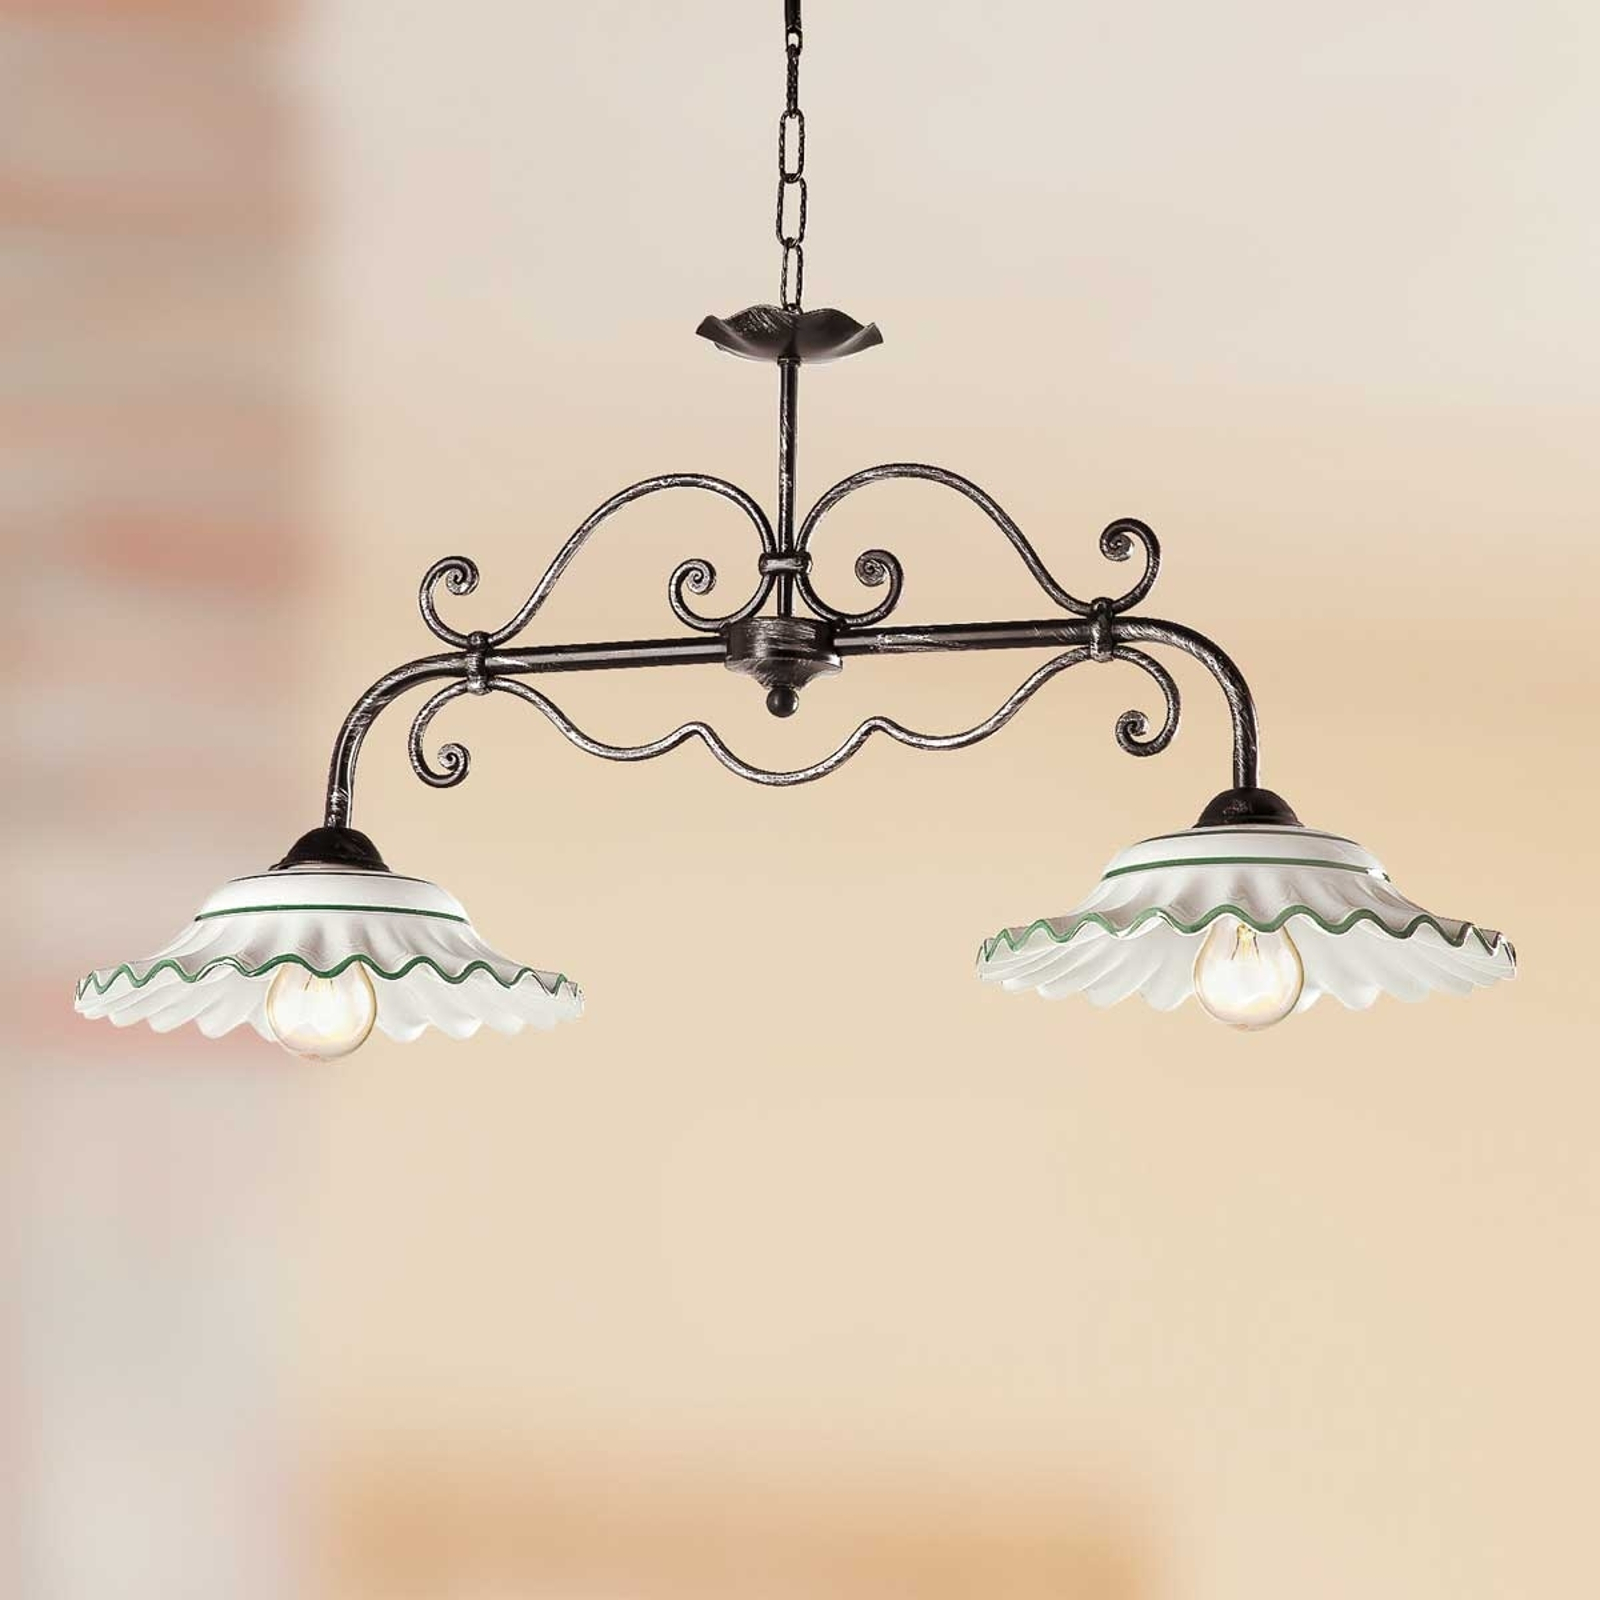 Speelse hanglamp I BILIARDI, 2-lichts